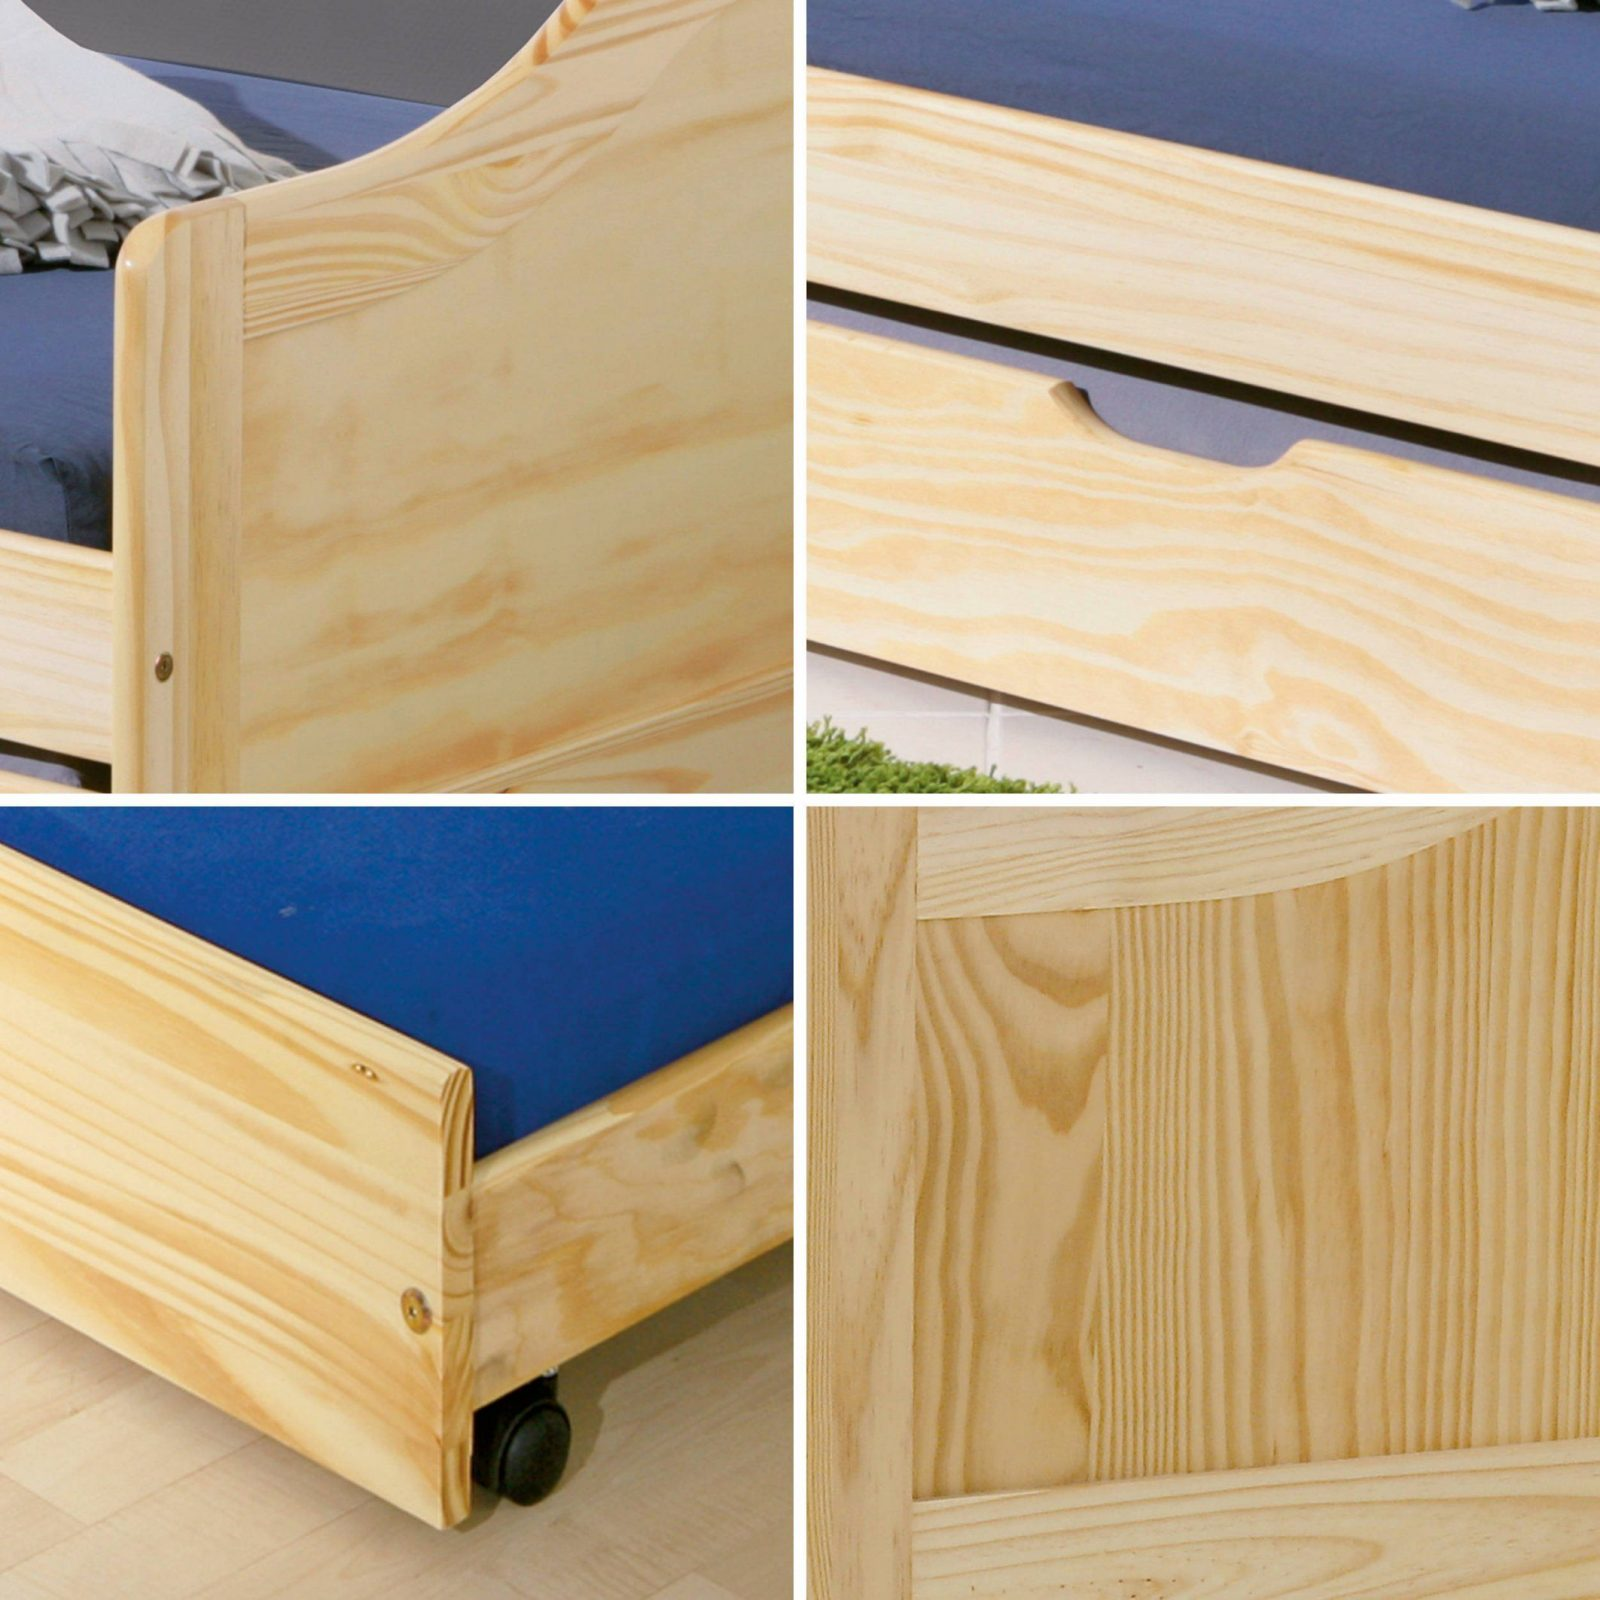 Massivholzbett 90X200 Cm Kinderbett Bett Funktionsbett Kojenbett von Kojenbett Kiefer Massiv 90X200 Photo